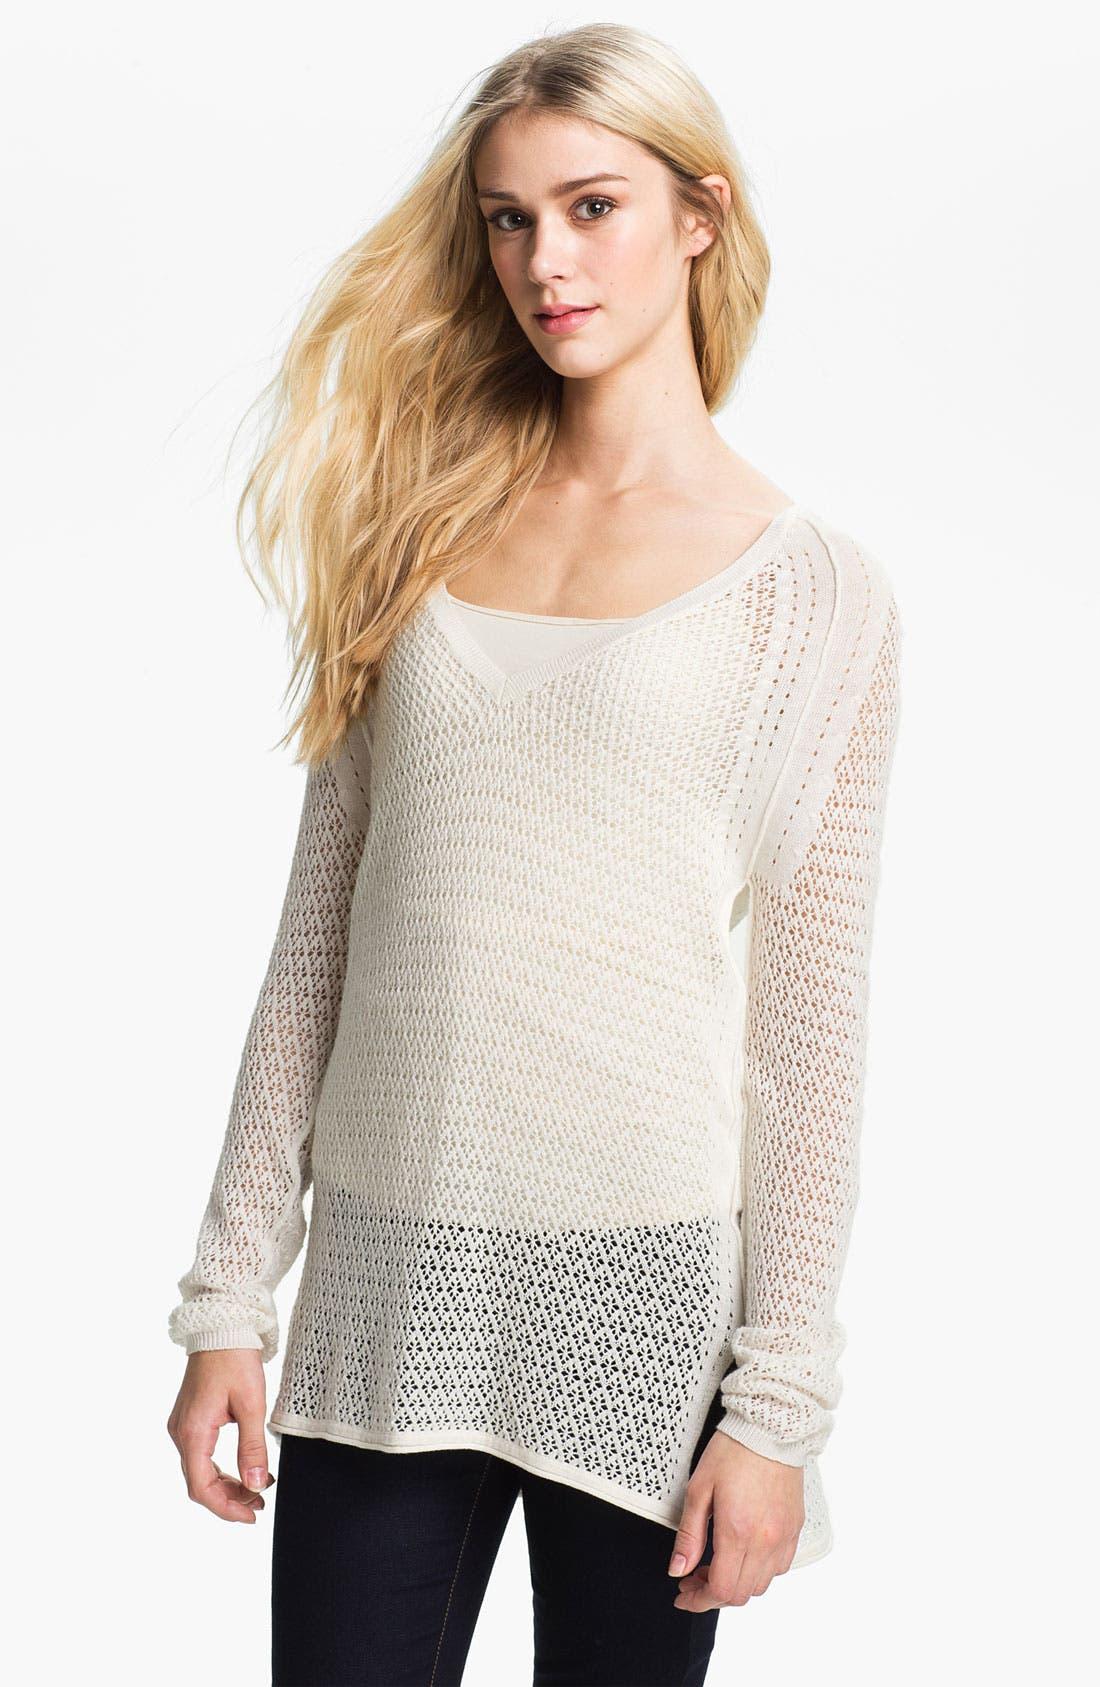 Main Image - Ella Moss 'Julia' Pointelle Tunic Sweater